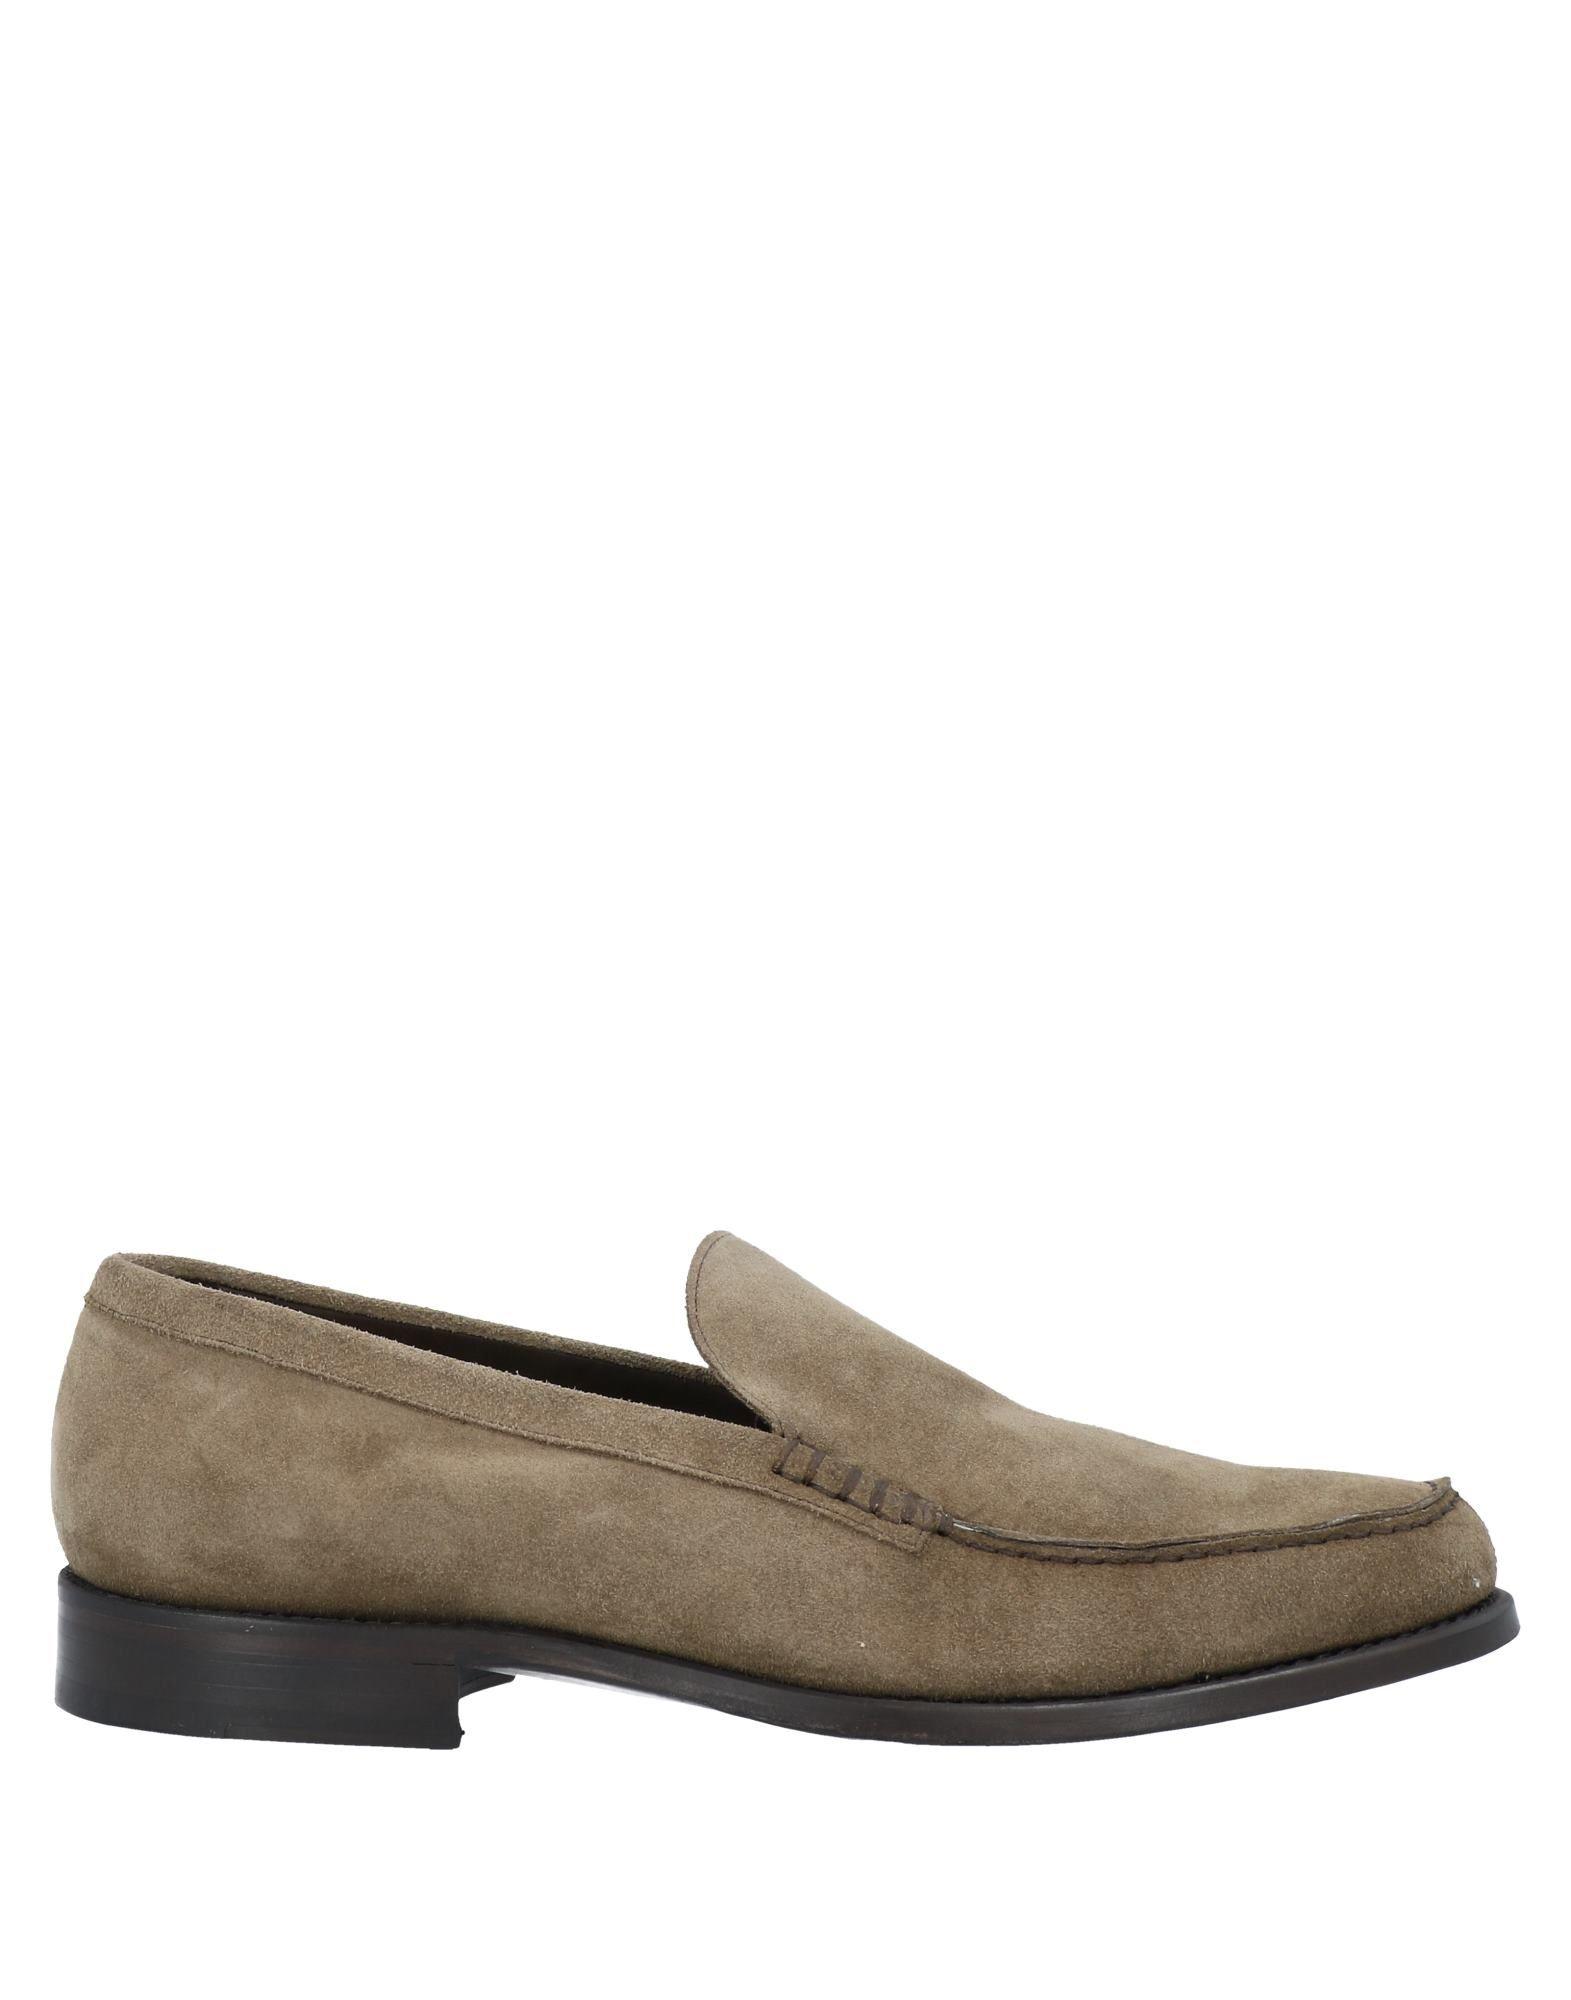 J.WILTON Loafers - Item 17074874